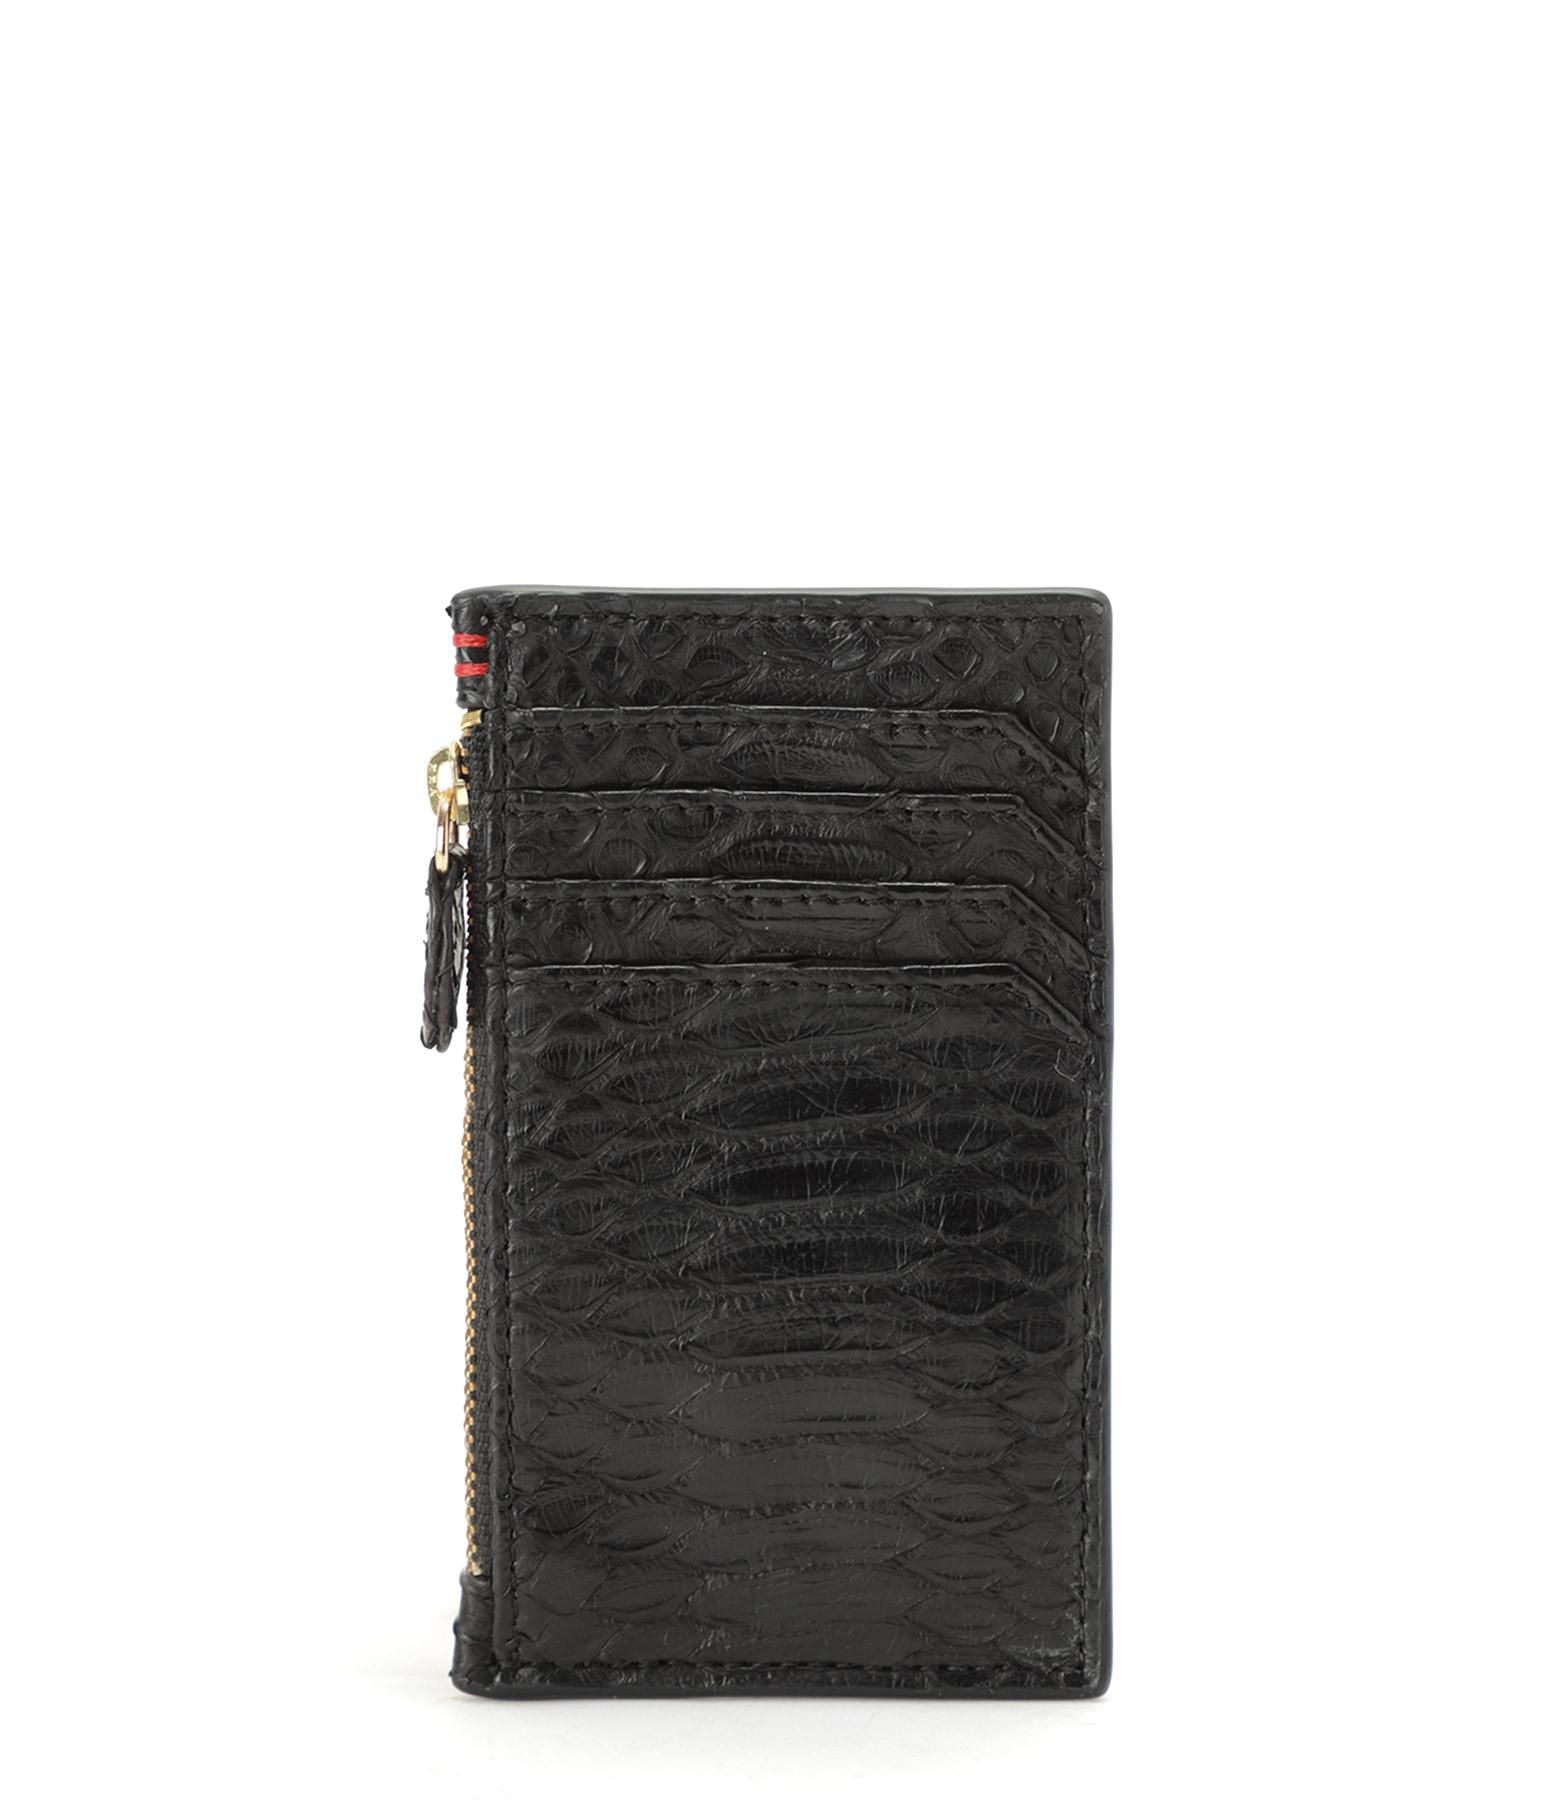 CLARIS VIROT - Porte-cartes Héléna Python Noir